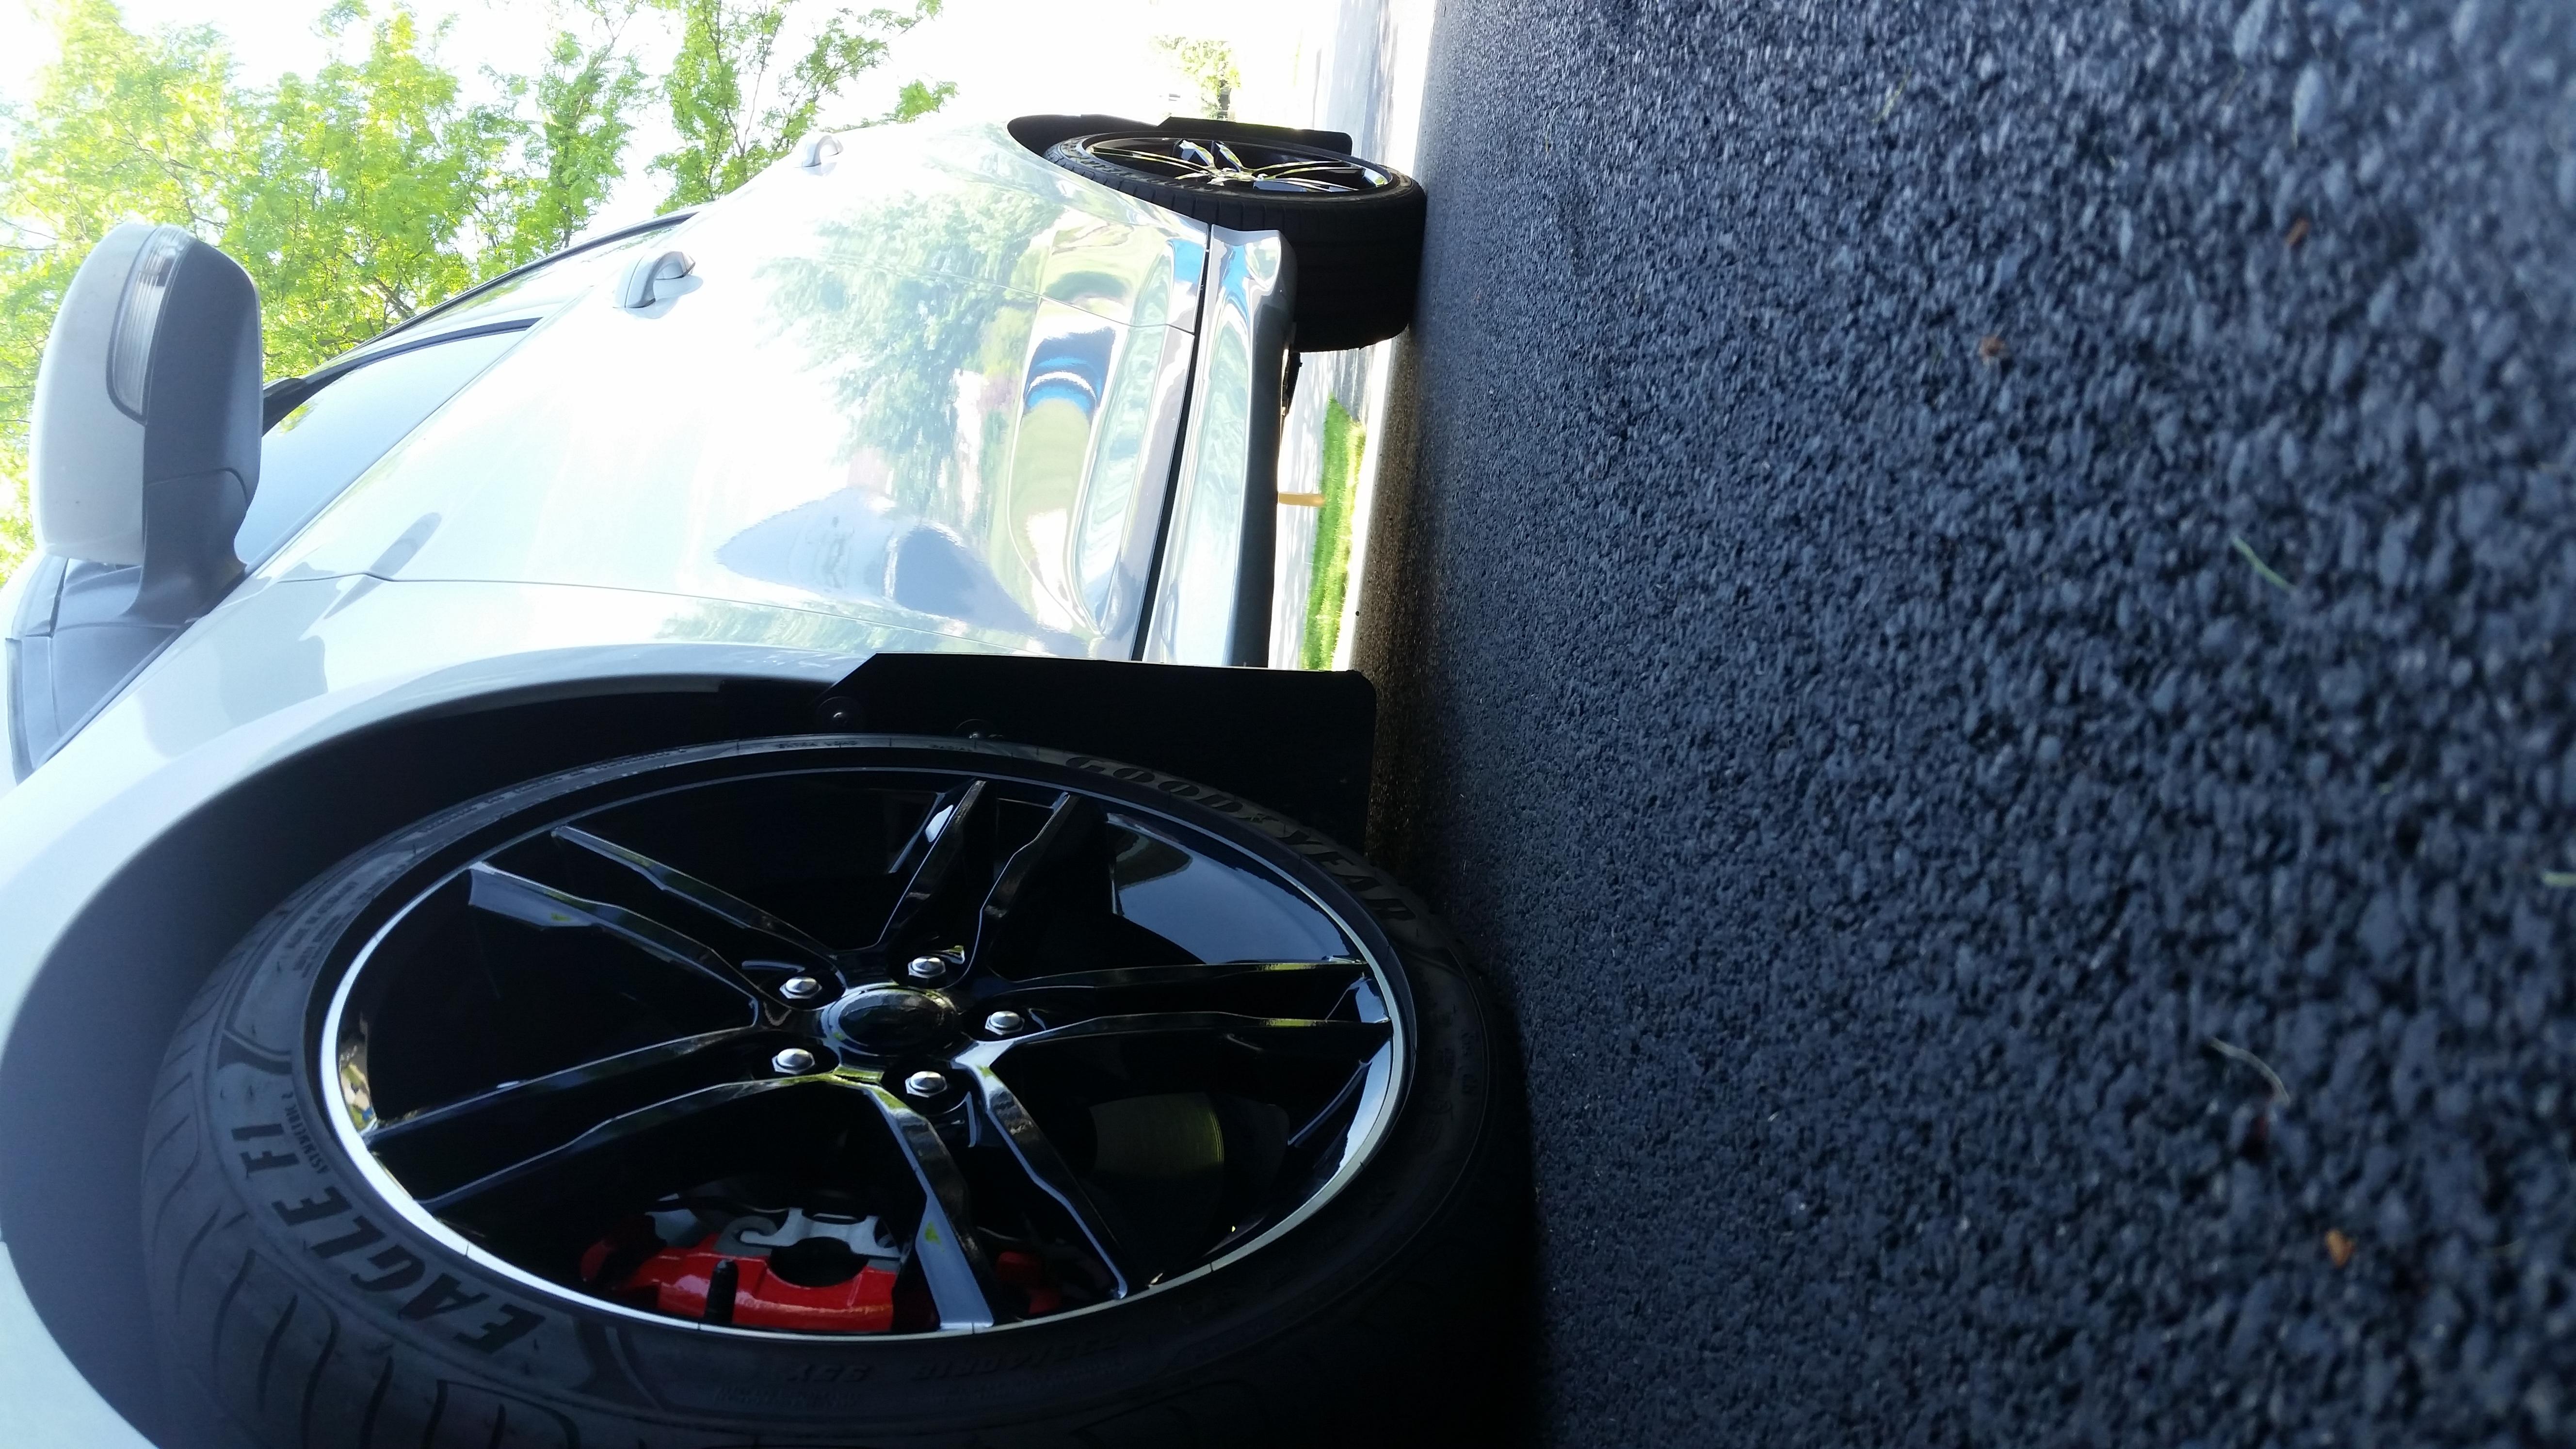 Factory Premium Wheels - Gloss Black Vinyl Wrap